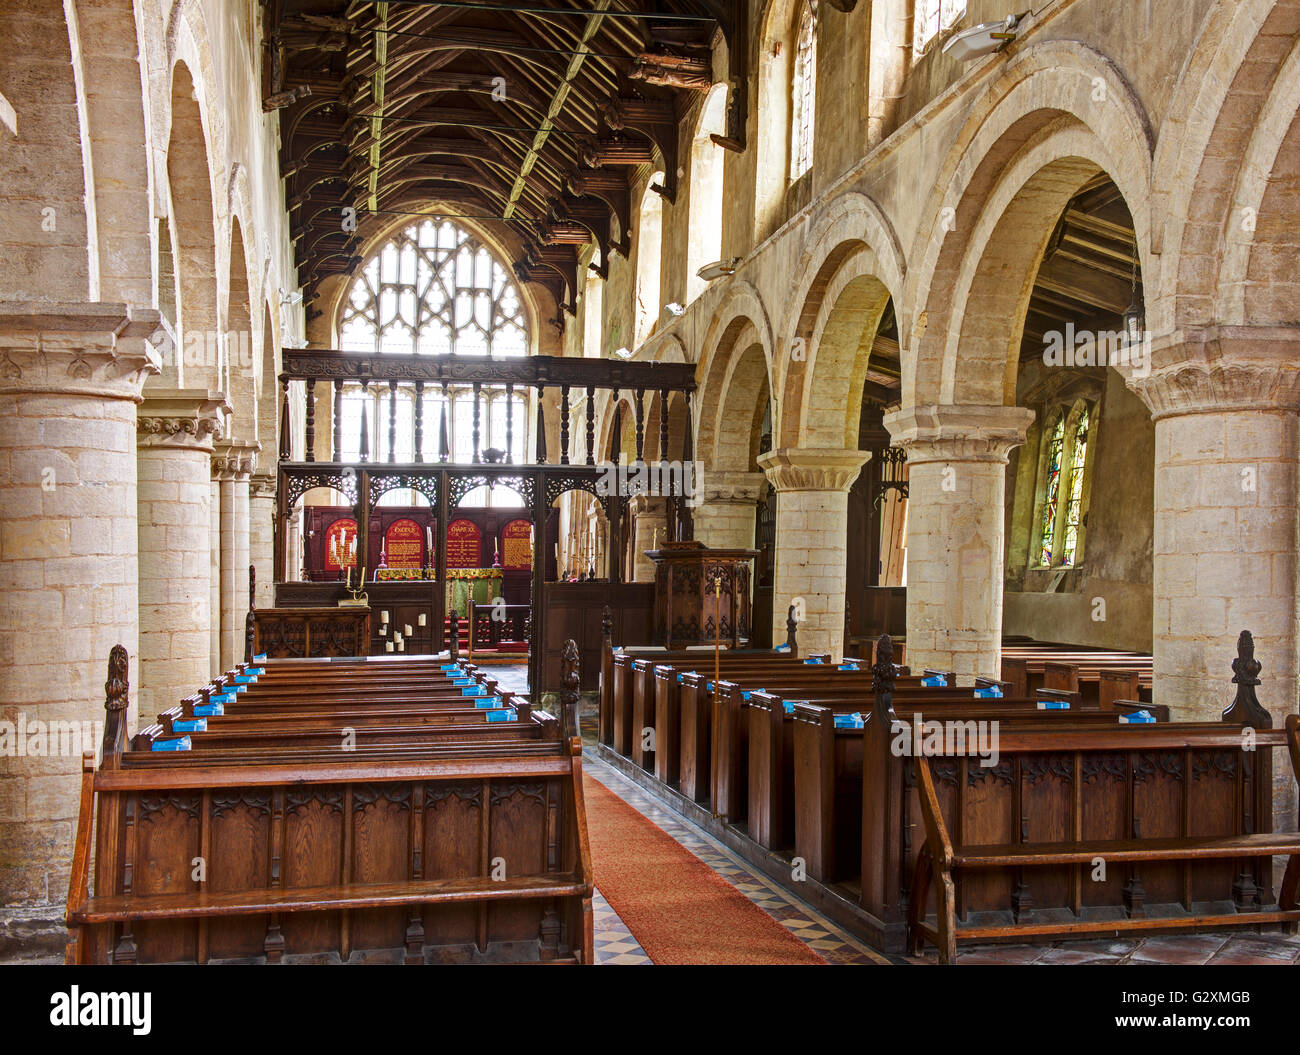 Interior of All Saints Church, Tilney All Saints, Norfolk, England UK - Stock Image